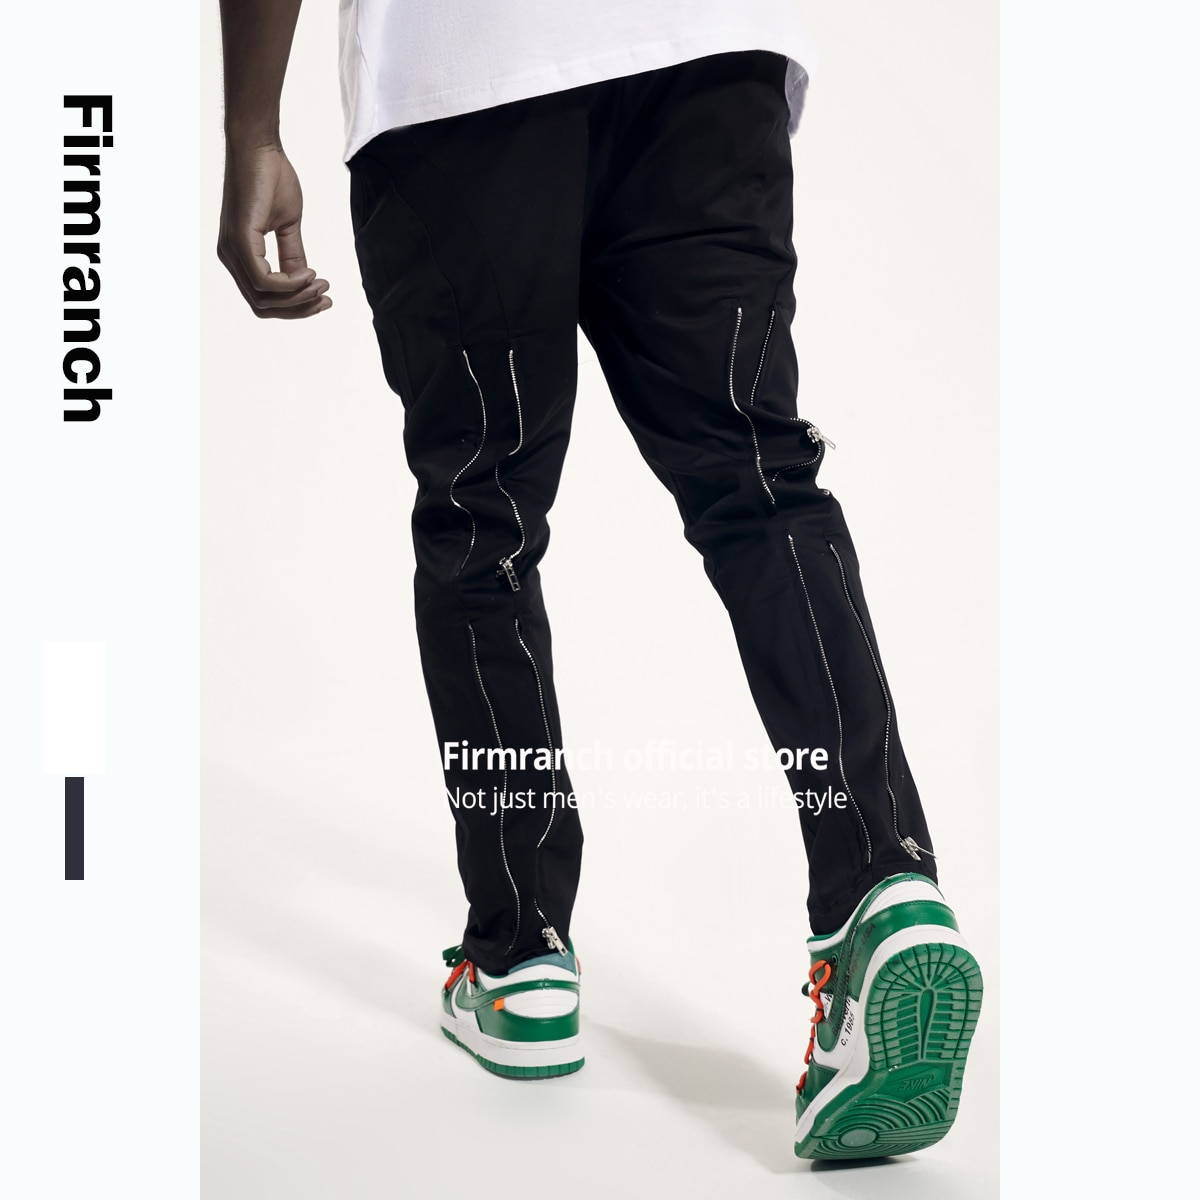 Firmranch أخبار 2021 عالية الشارع Kenijima السراويل عودة زمم فيبي Vuja نمط دي Ramifier الرجال مفهوم السراويل مزدوجة ارتداء